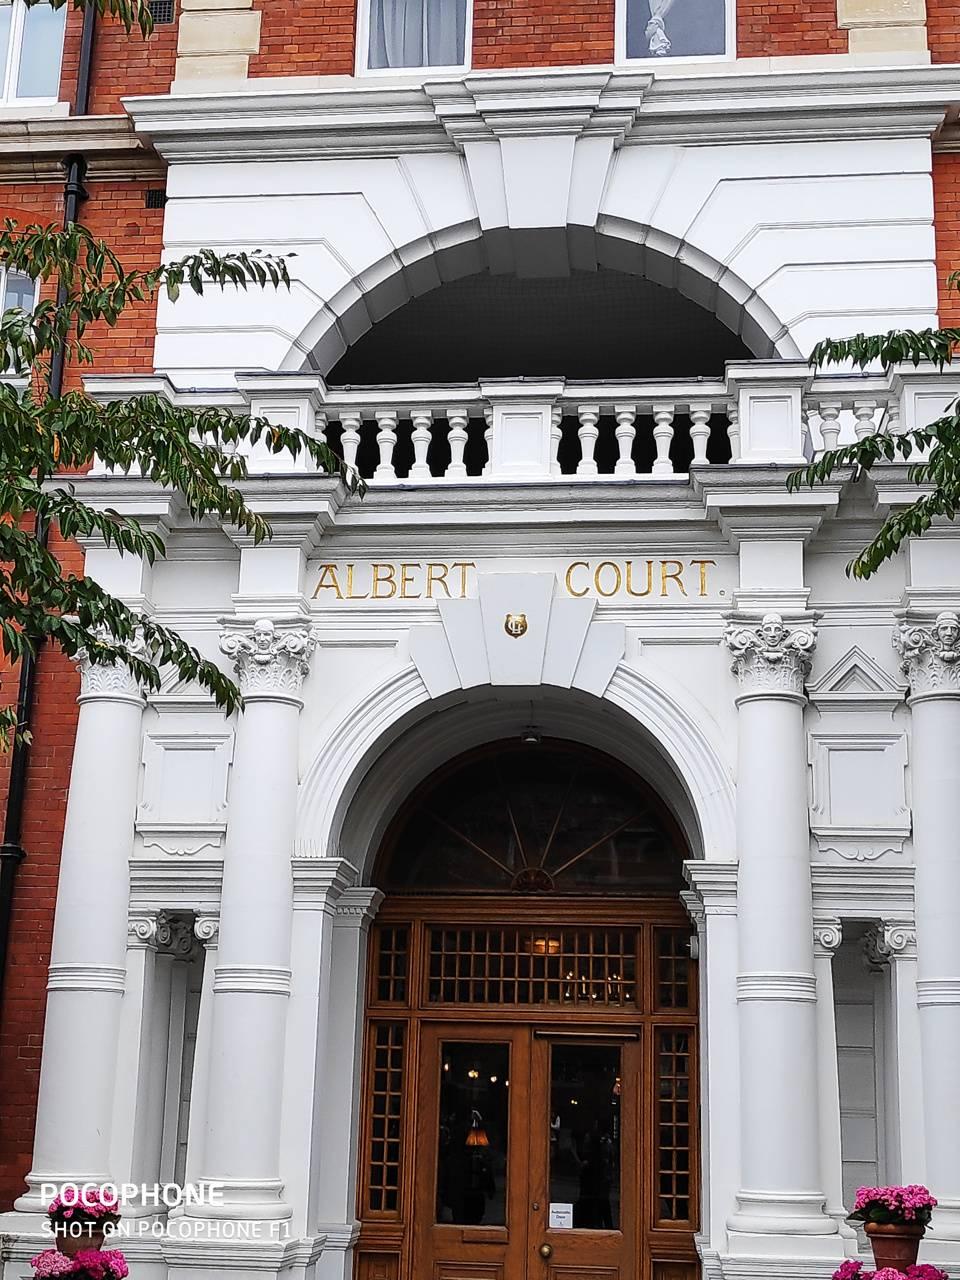 Albert court